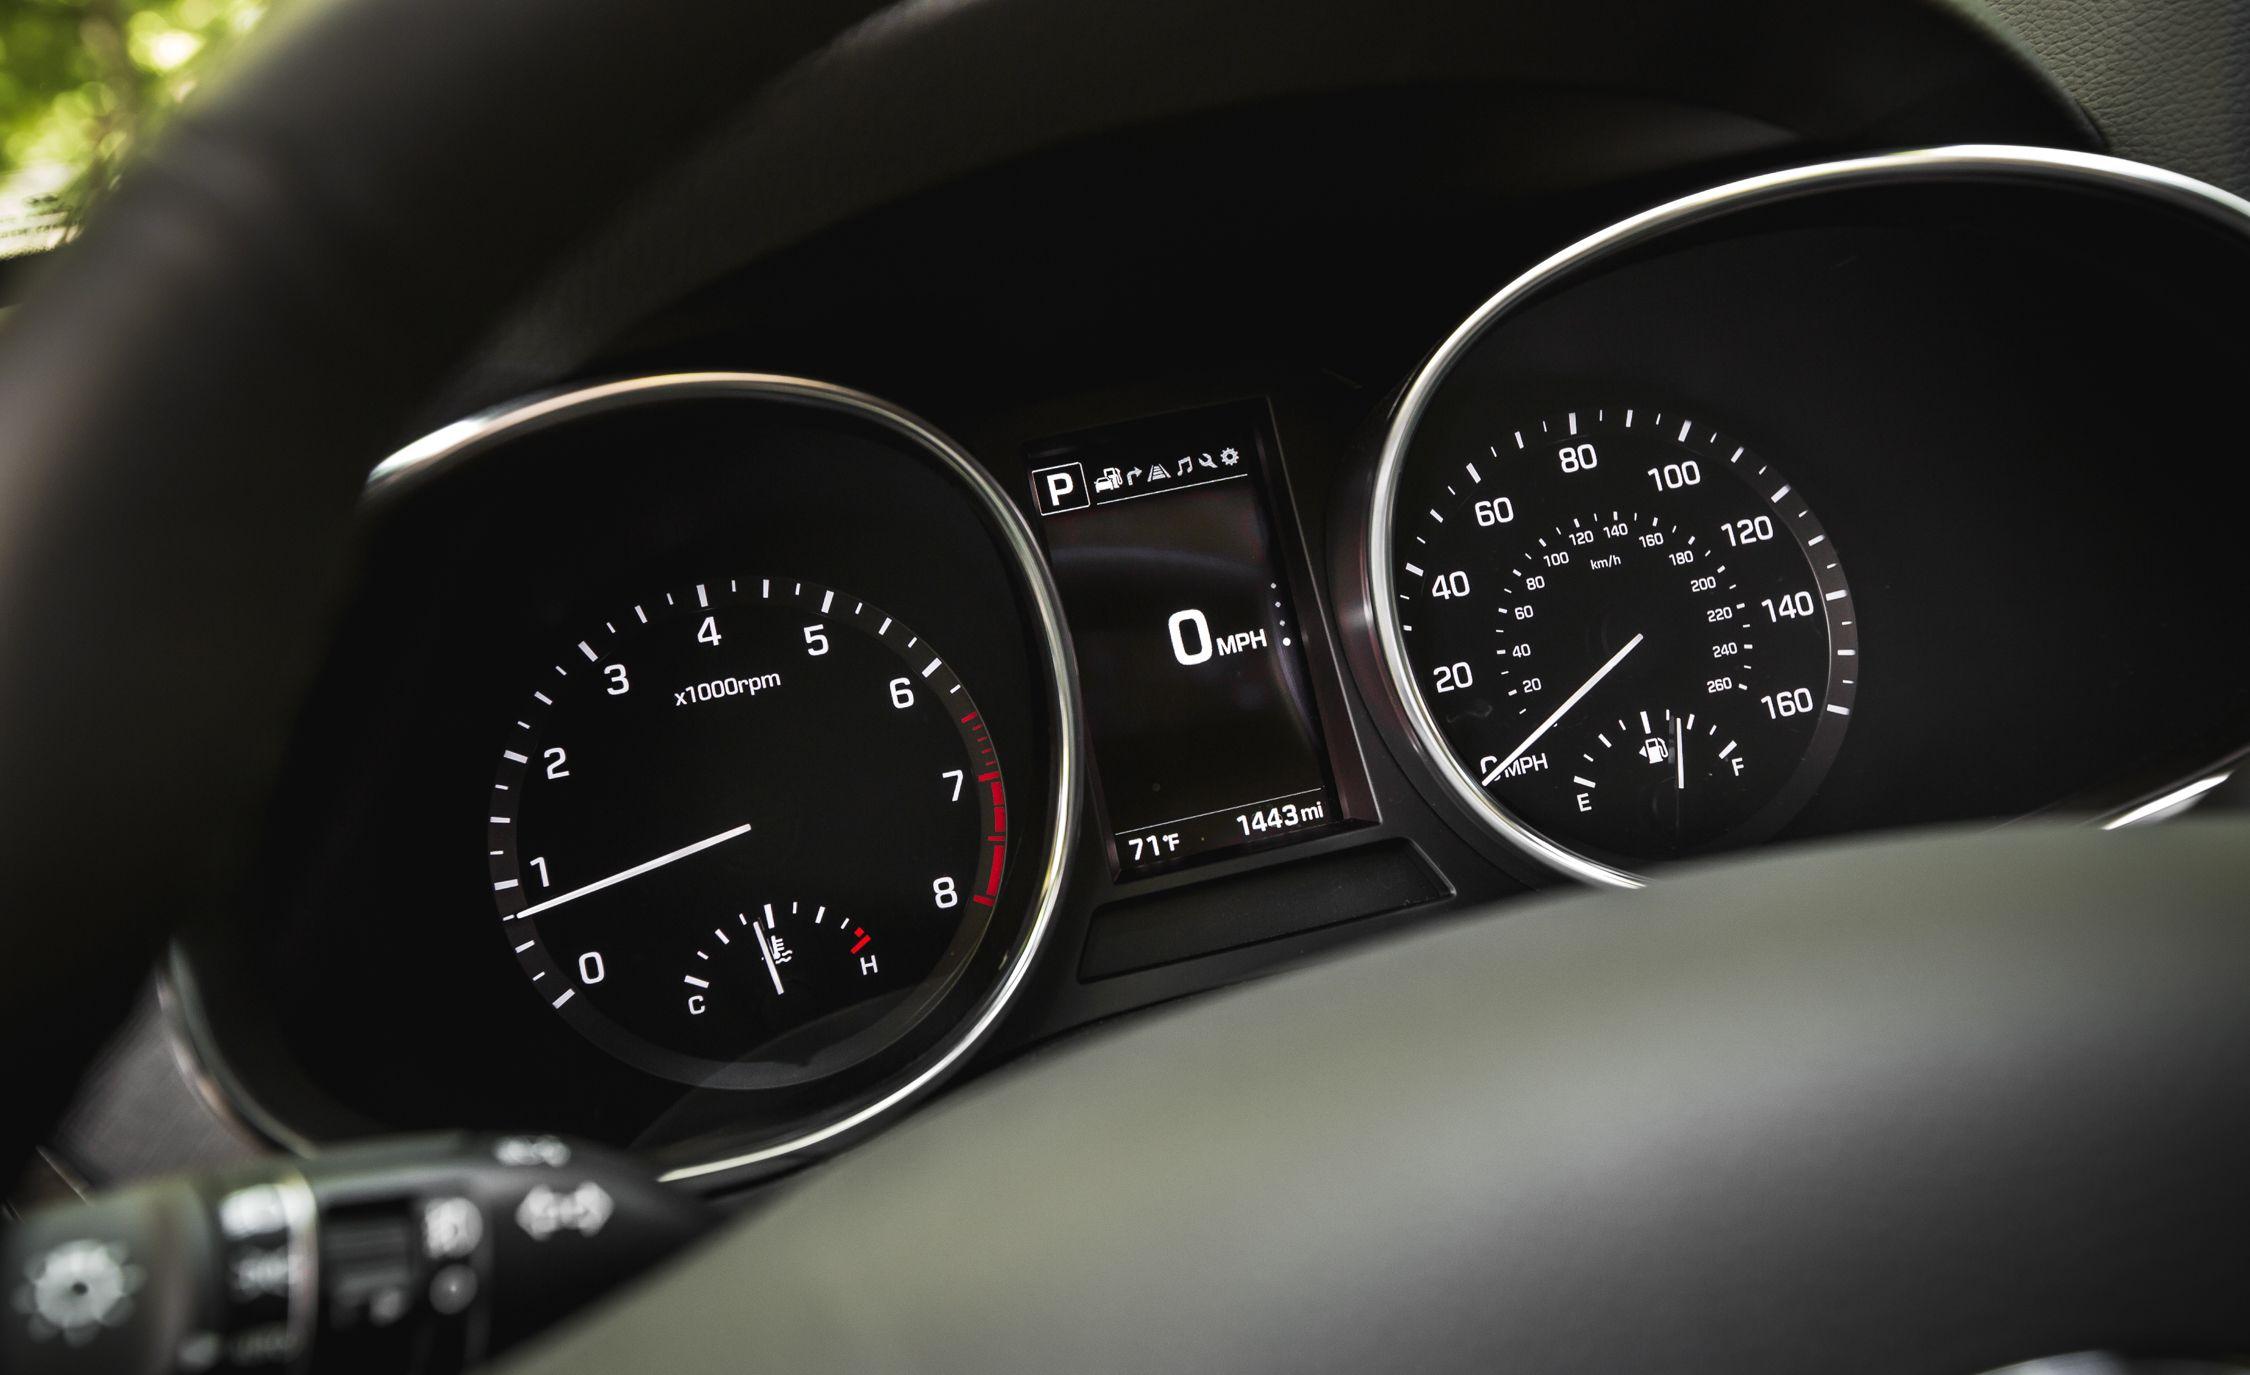 Hyundai Santa Fe Sport Reviews Price Toyota Rav4 Temp Gauge Wiring Photos And Specs Car Driver